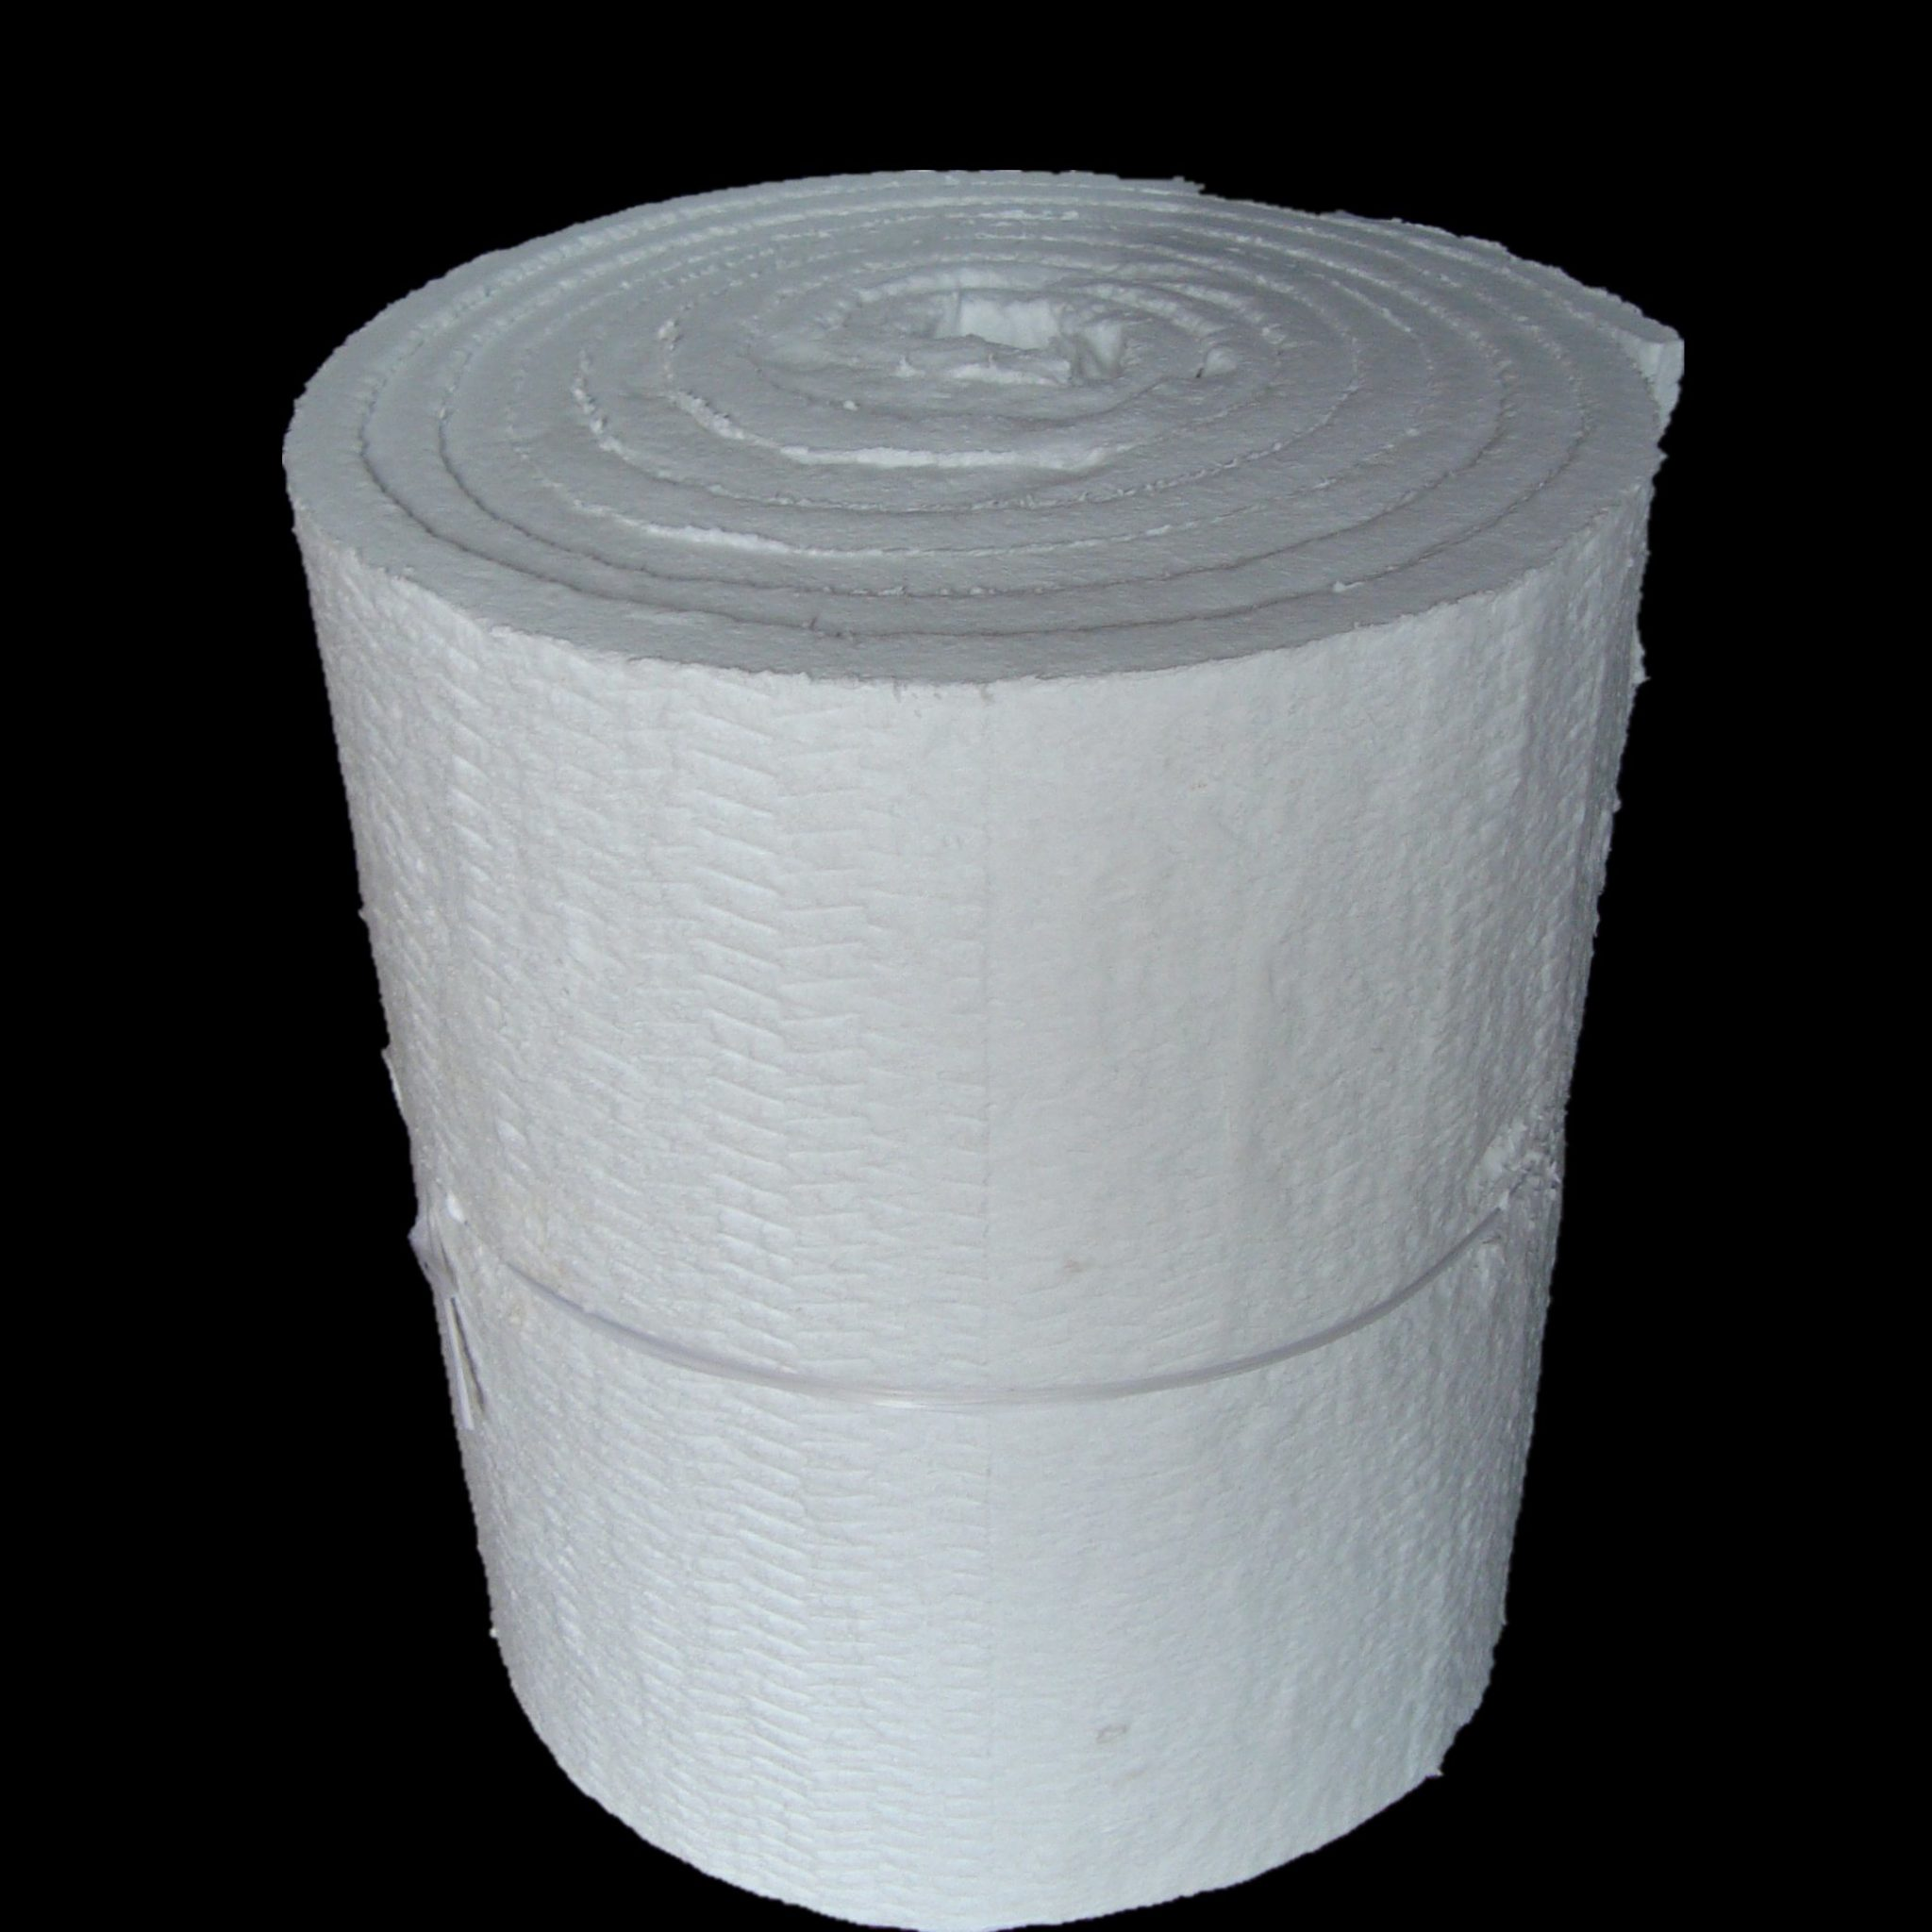 High-Purity-Ceramic-Fiber-Blanket-for-Furnace-Insulating